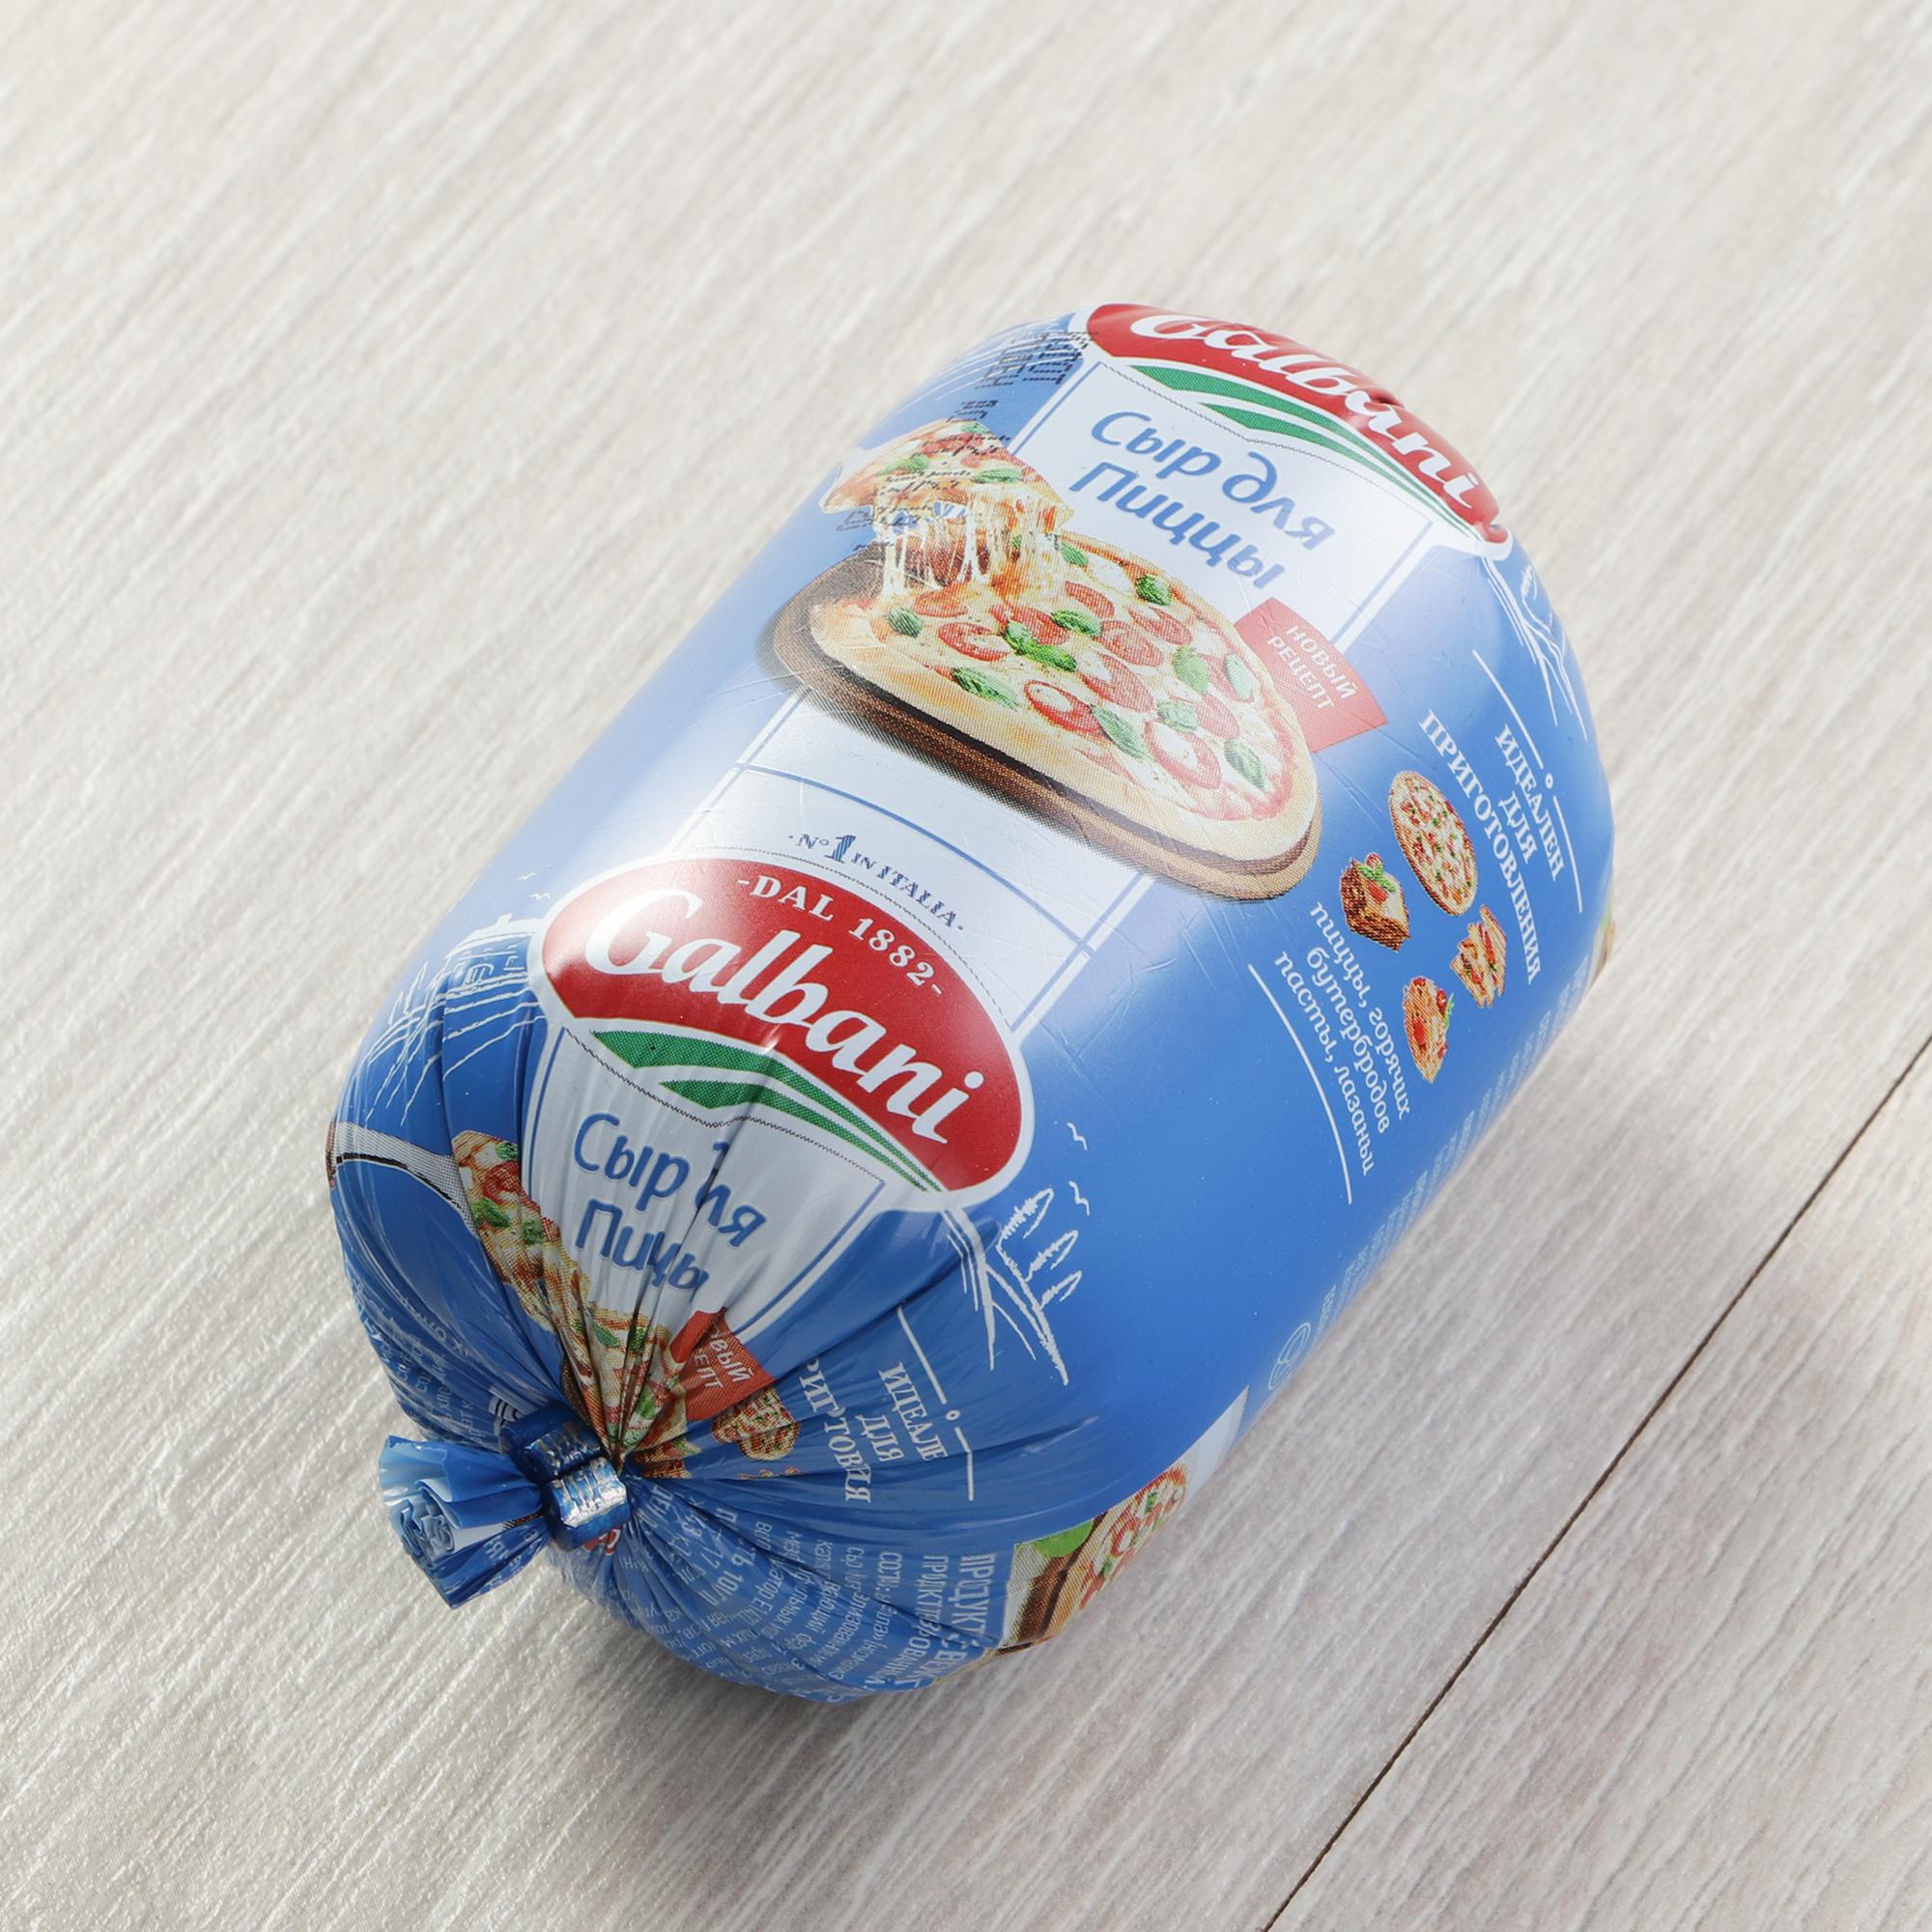 Сыр Galbani Pizza Cheeze 40% 250 г недорого